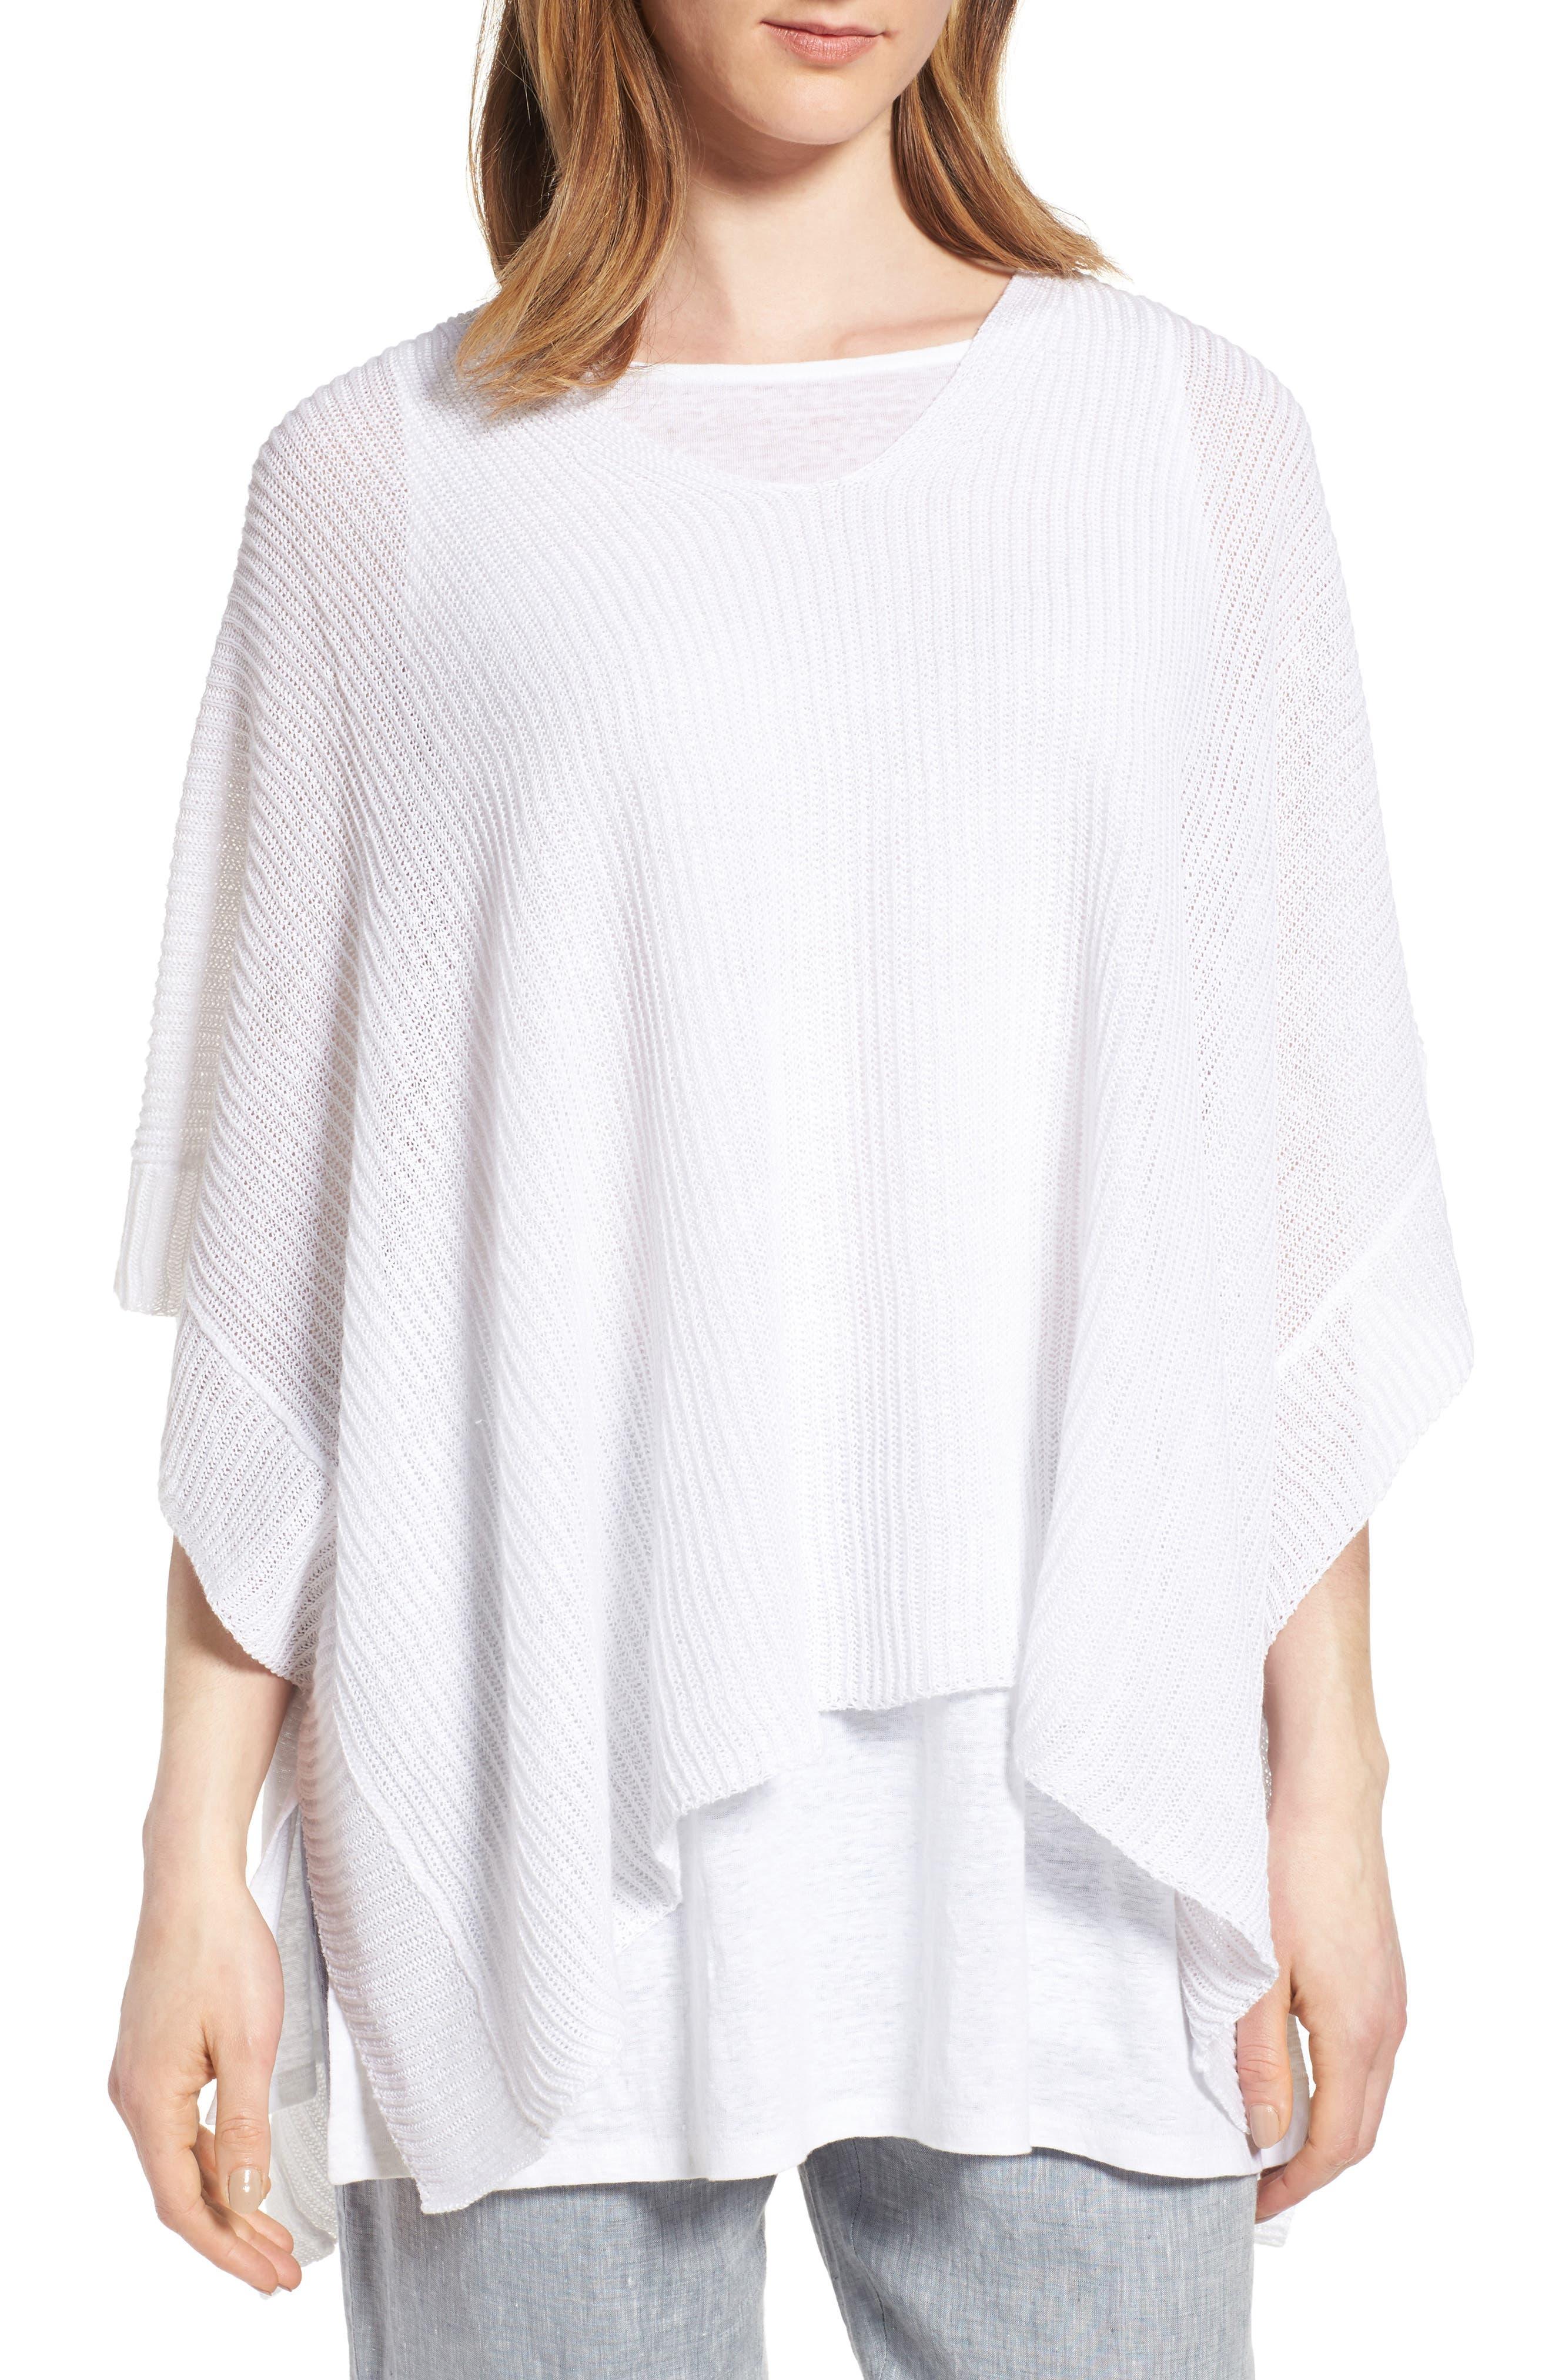 Eileen Fisher Organic Linen Knit Poncho